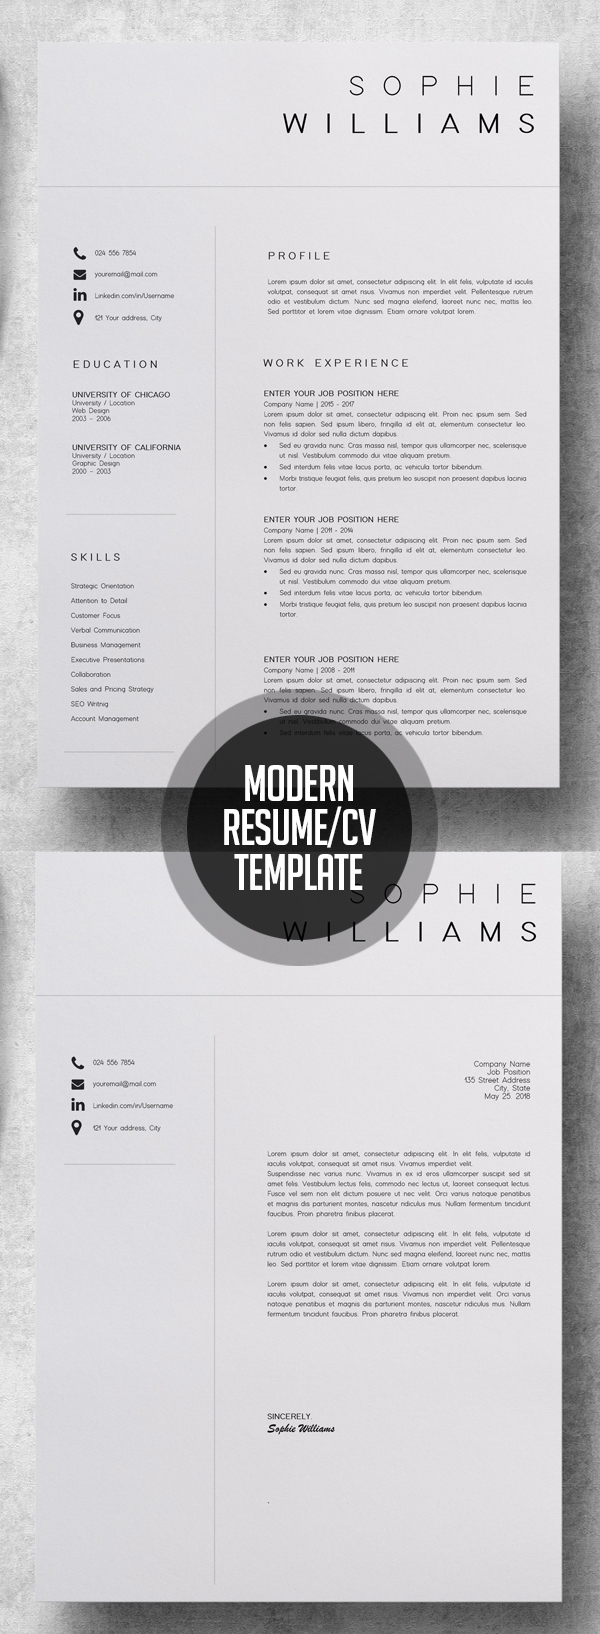 Modern Resume Template and CV Template #resumedesign